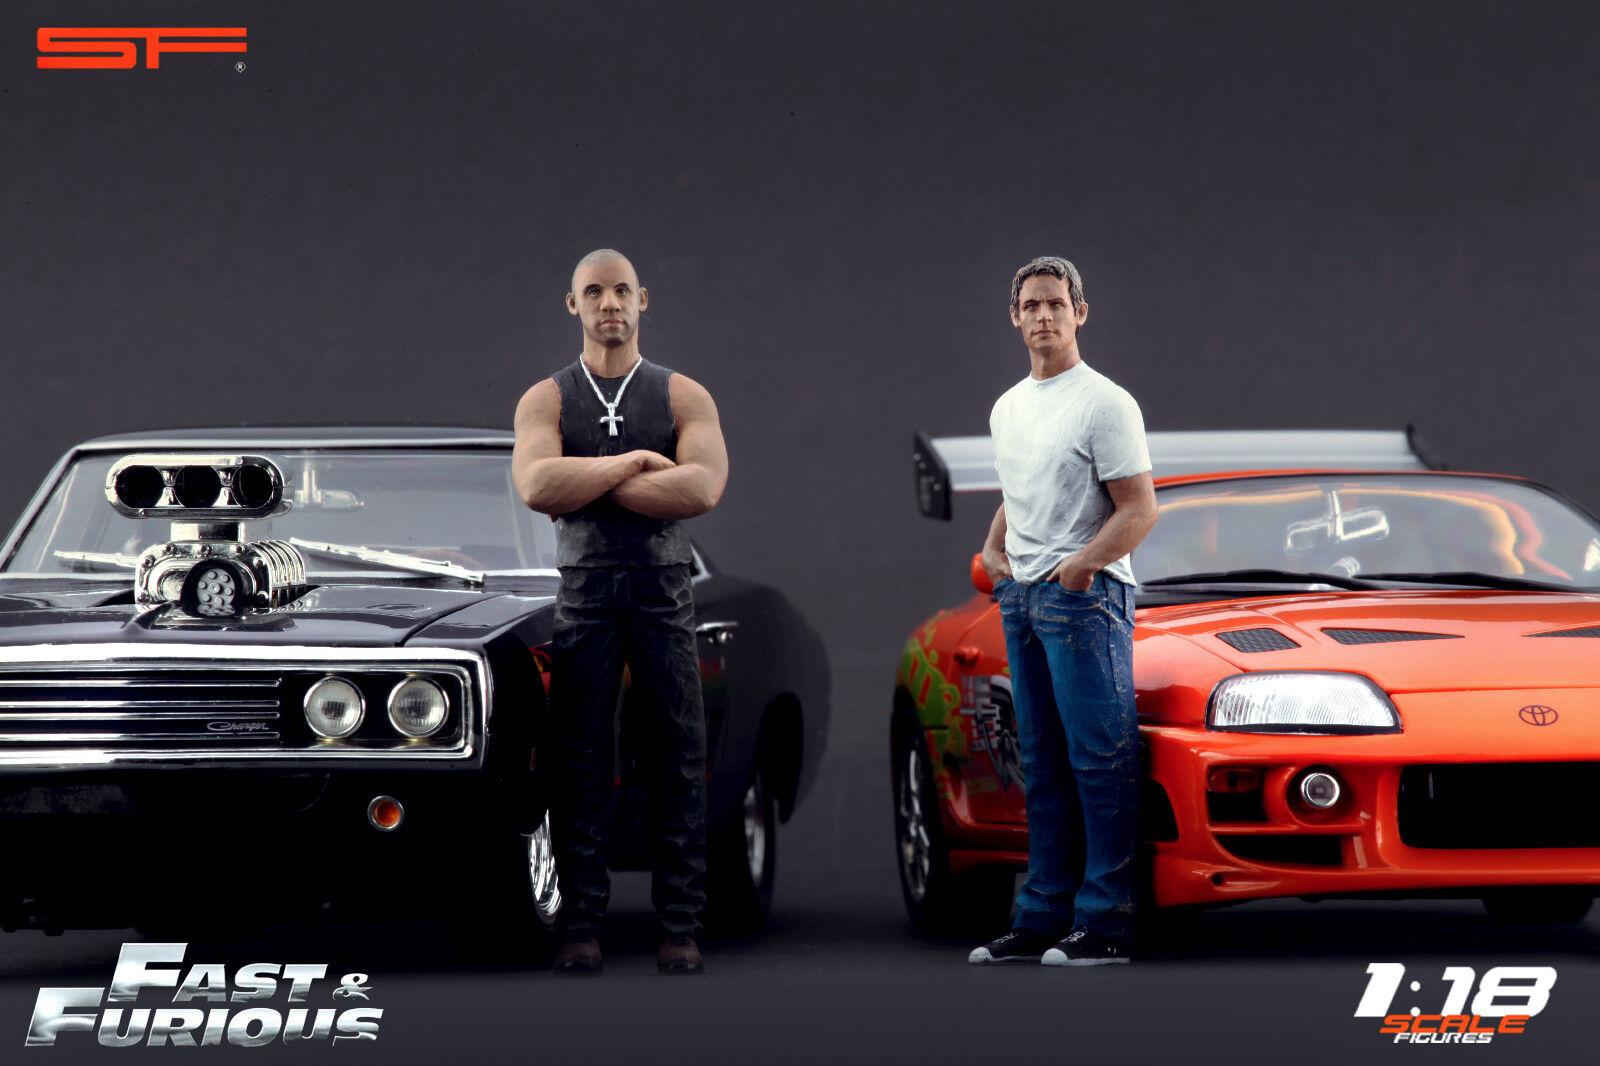 1 18 Fast & Furious Paul Walker Vin Diesel VERY RARE    figures for diecast cars